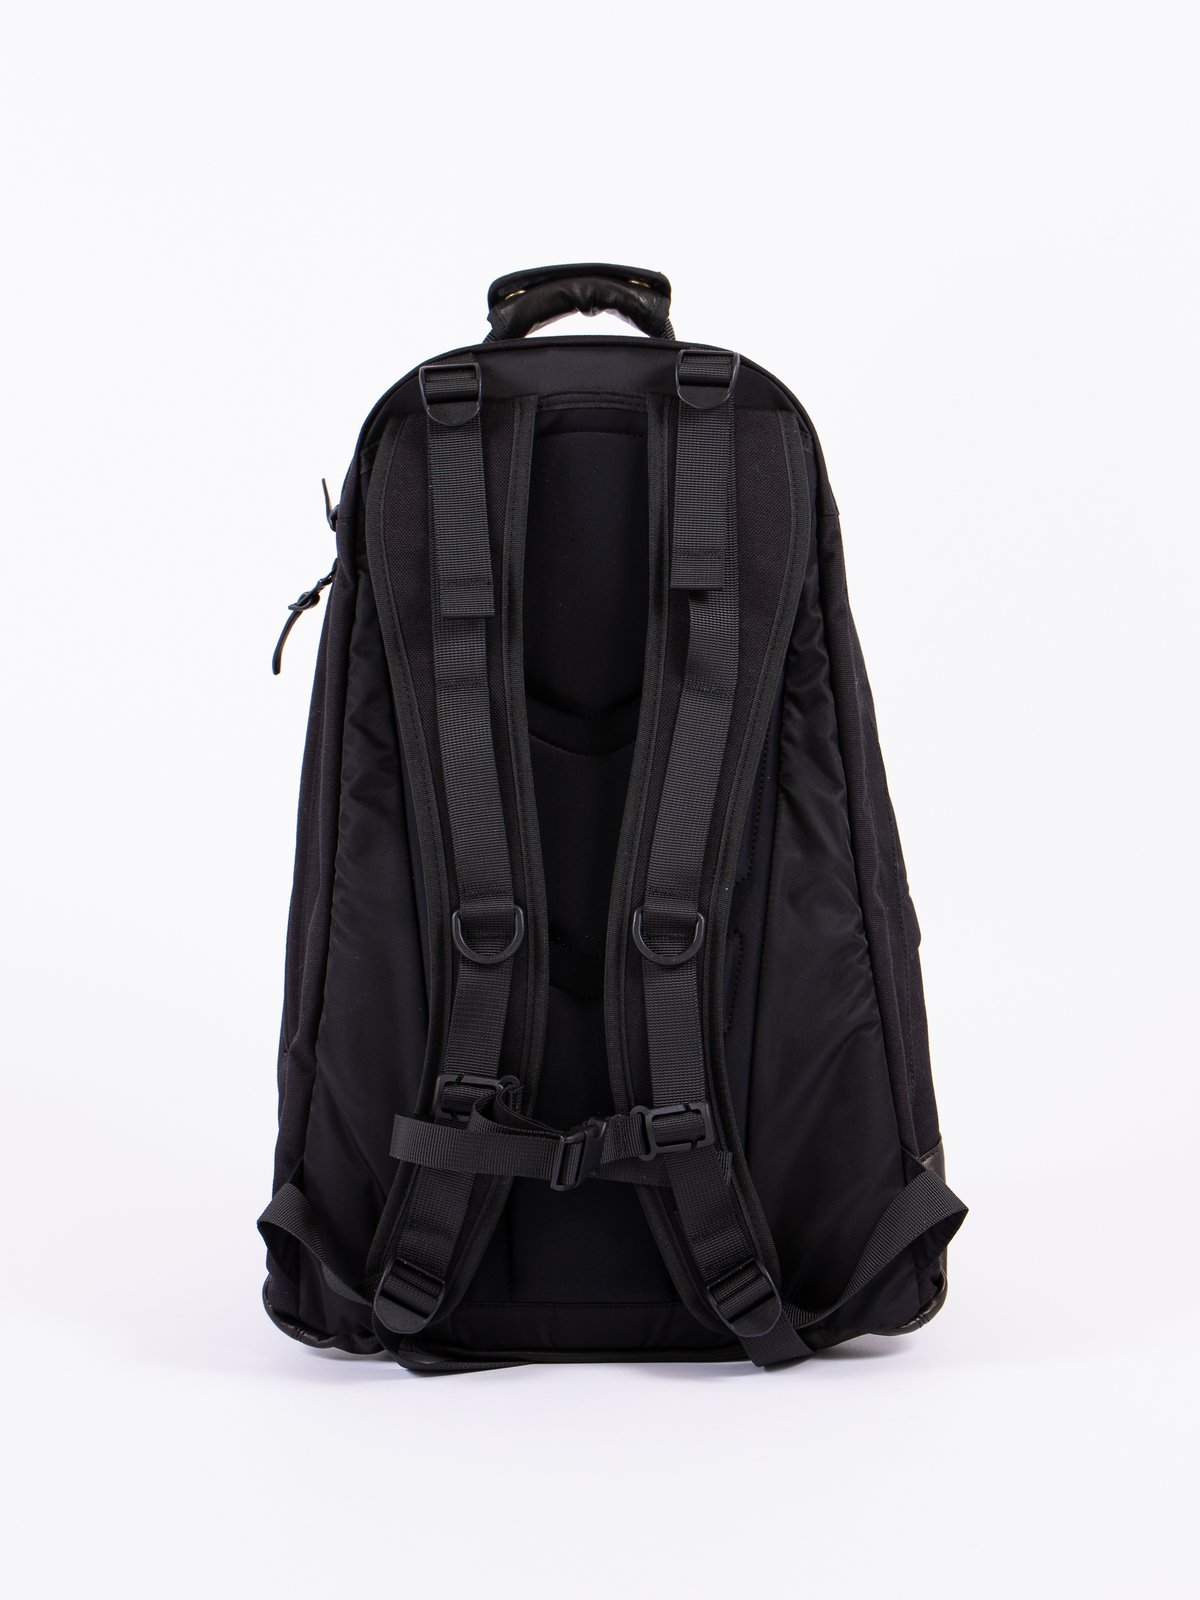 Black Fra Veg Lamb 22L Cordura Backpack - Image 2